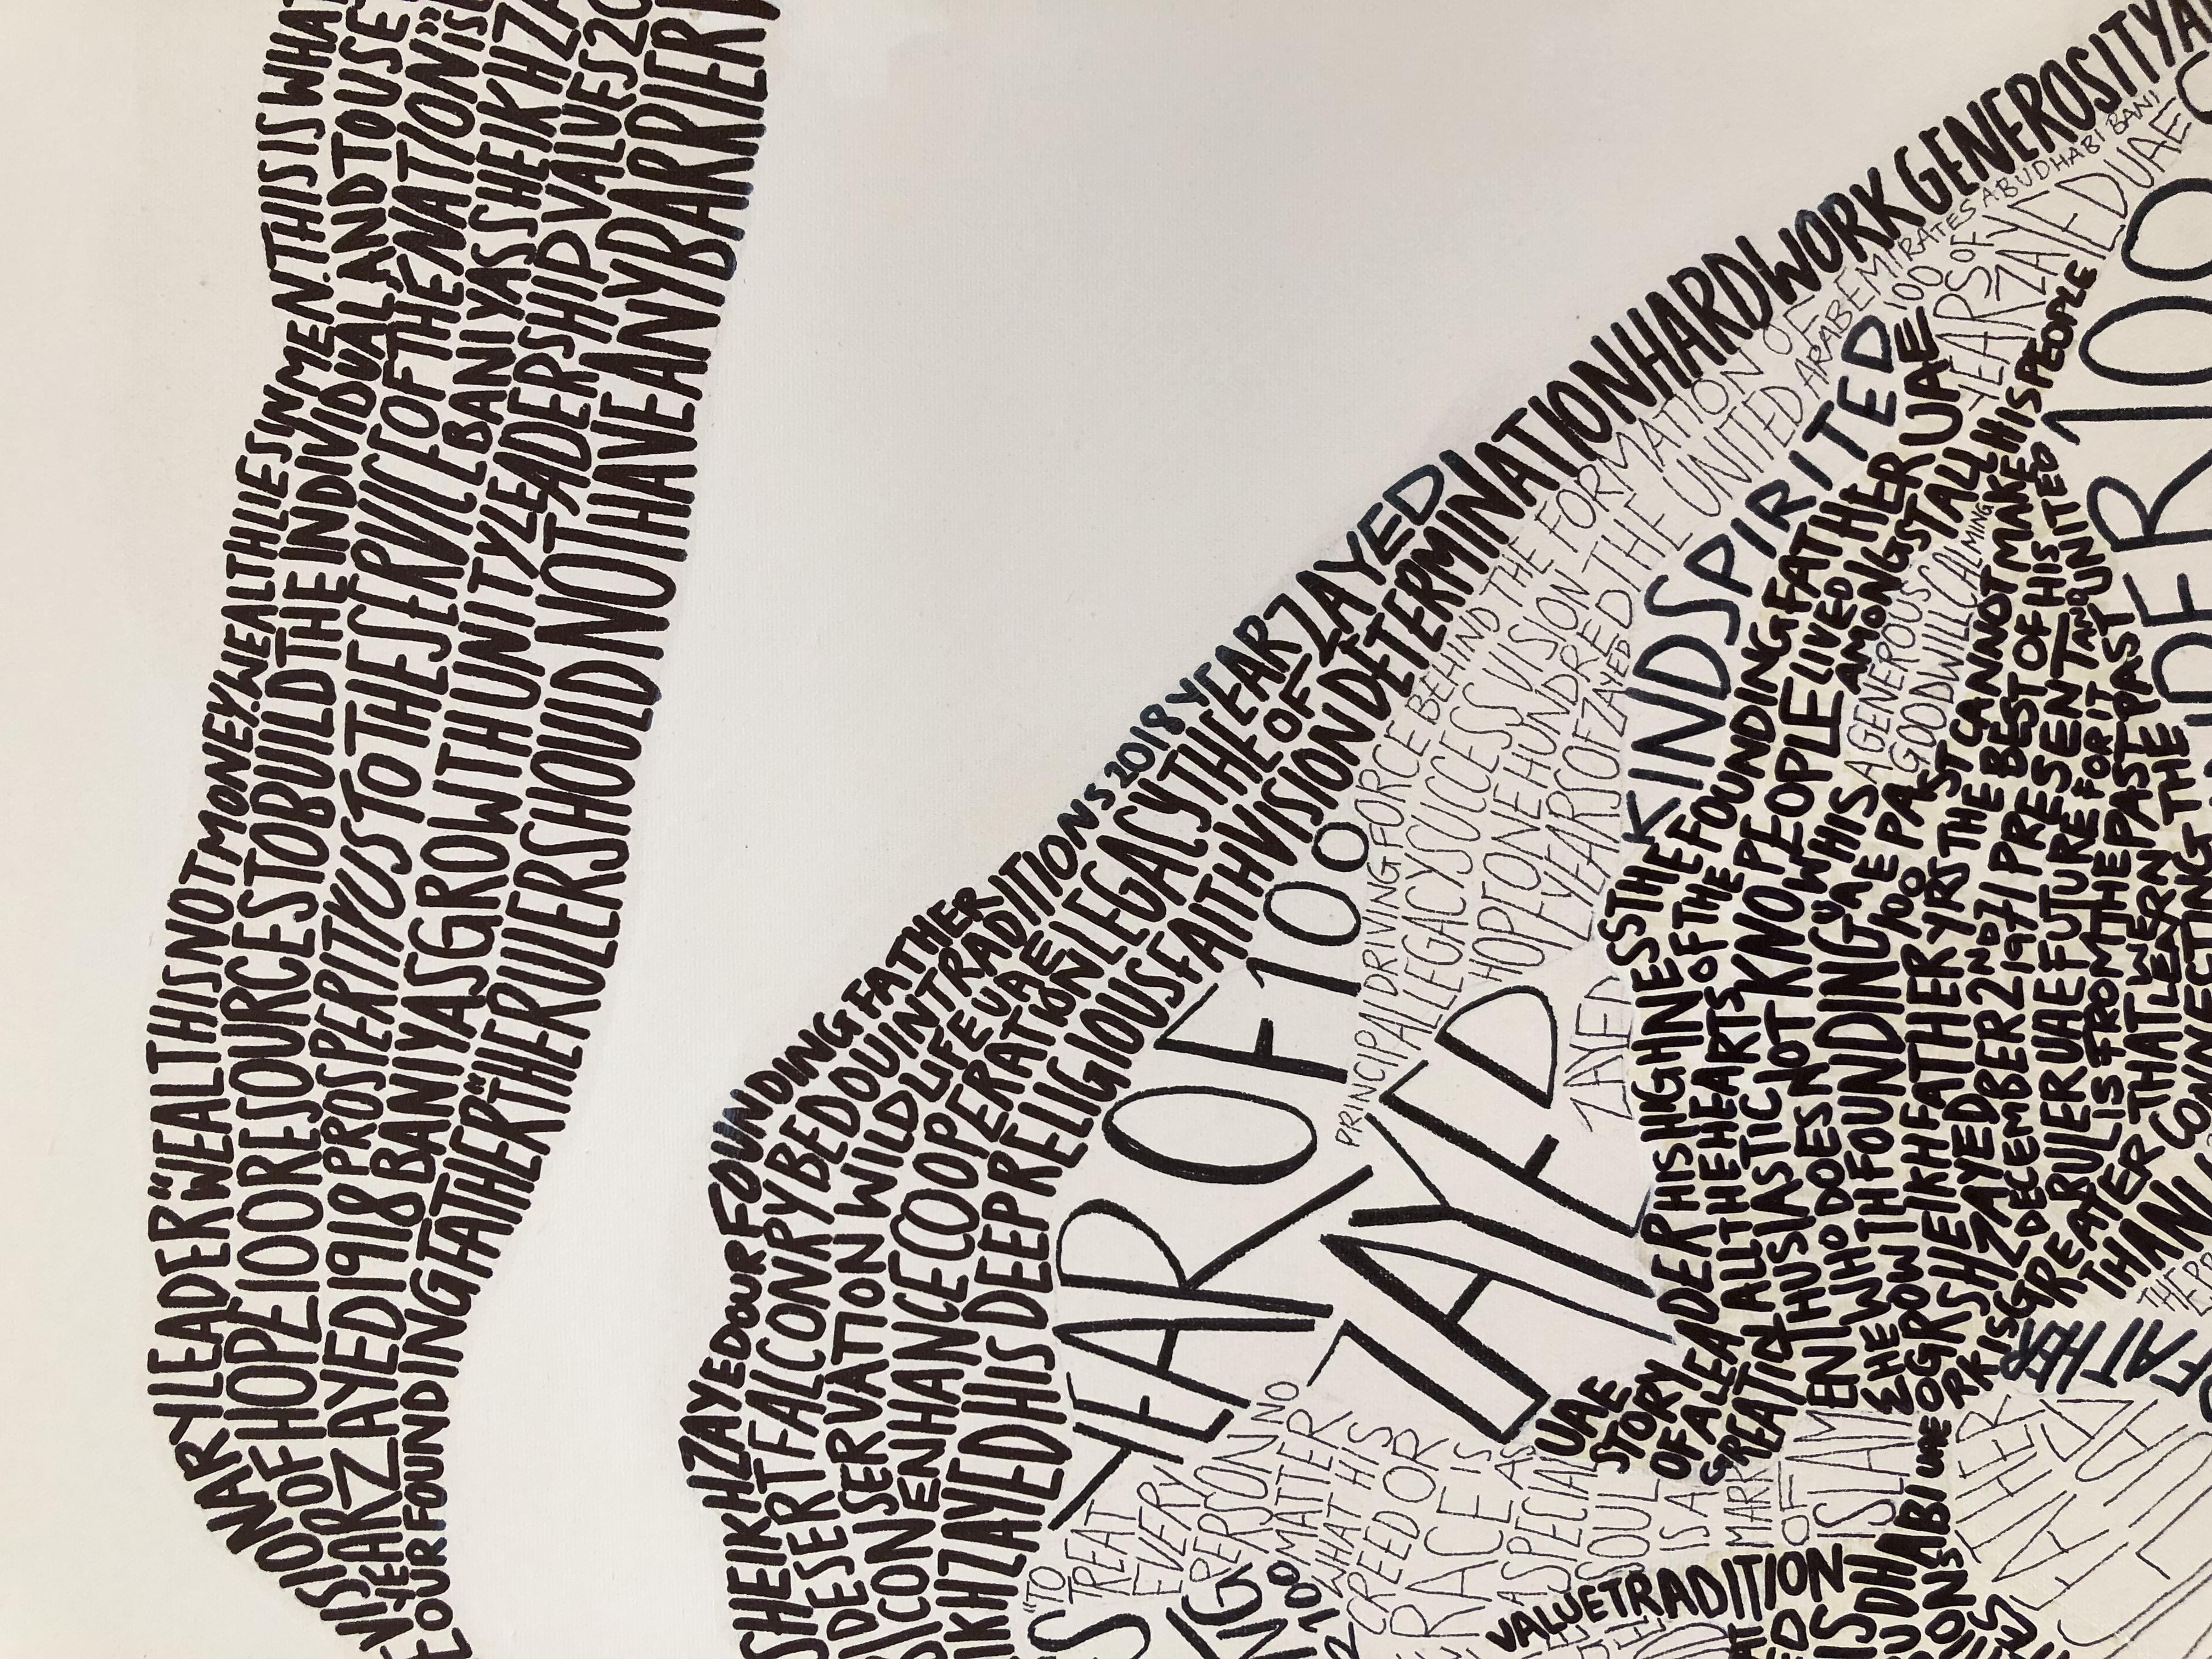 Story Of A Leader Natalie Daghestani Art Dubai Artist BSAB 4